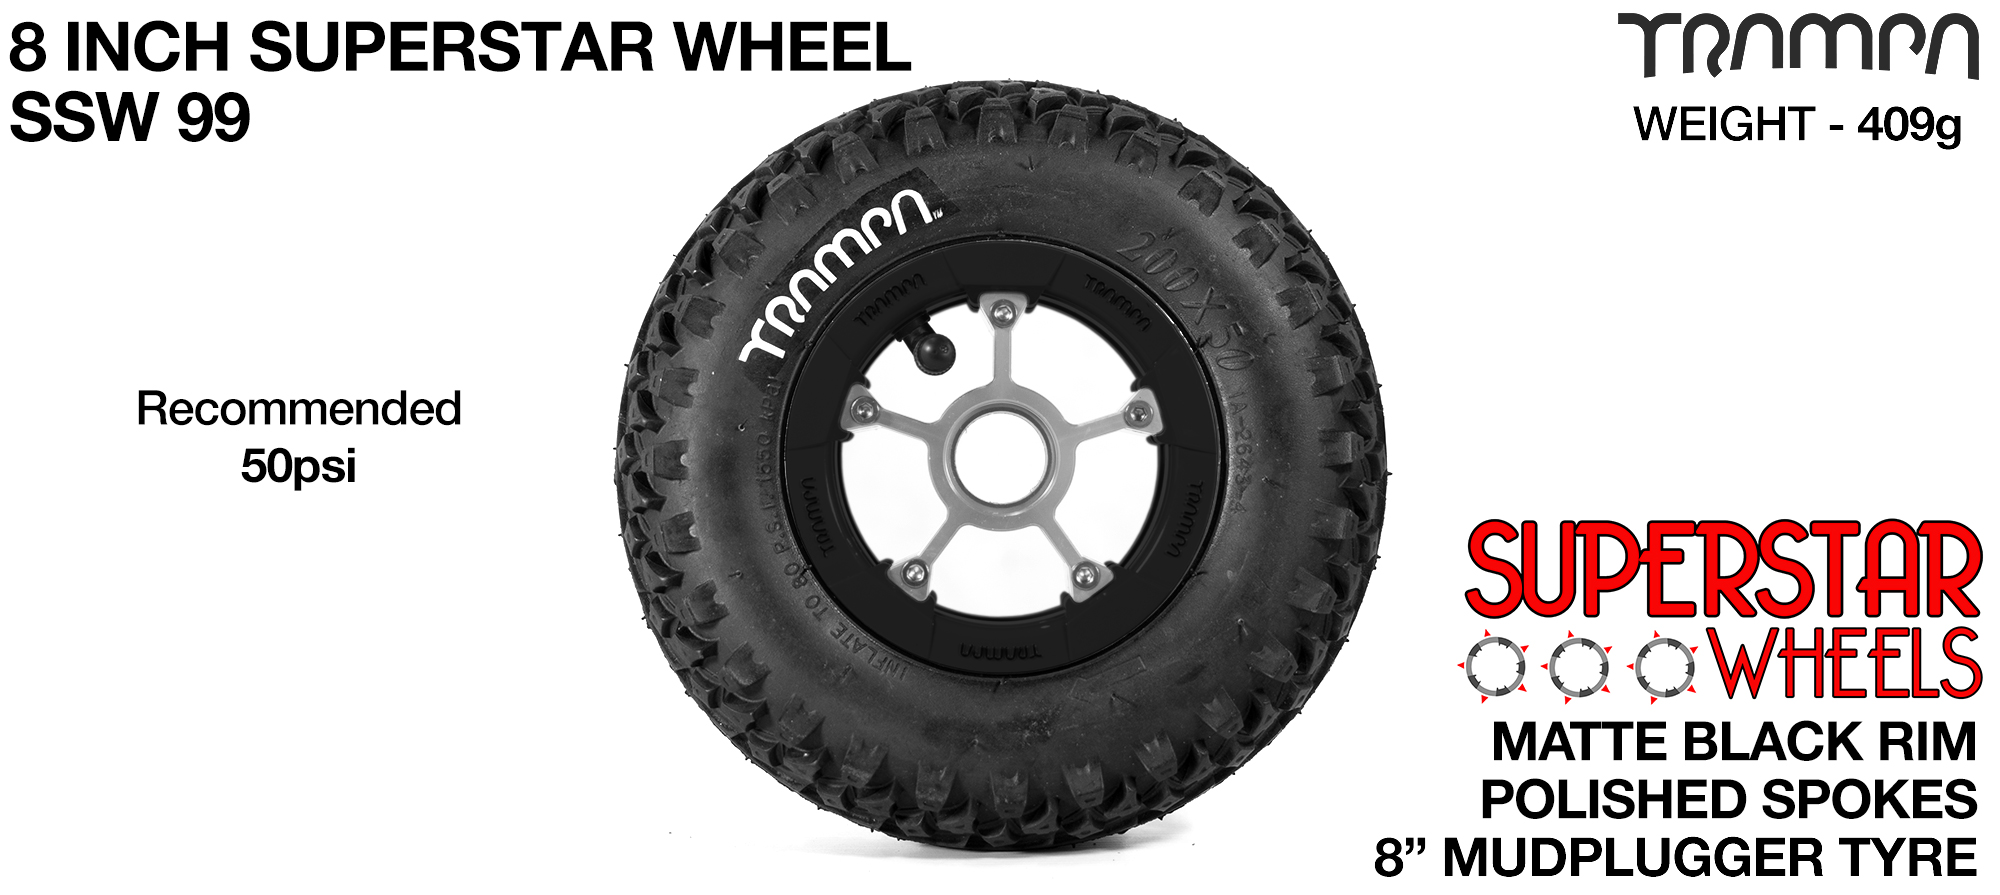 Superstar 8 inch wheels -  Matt Black Rim with Polished Spokes & Mud Plugger 8 Inch Tyre